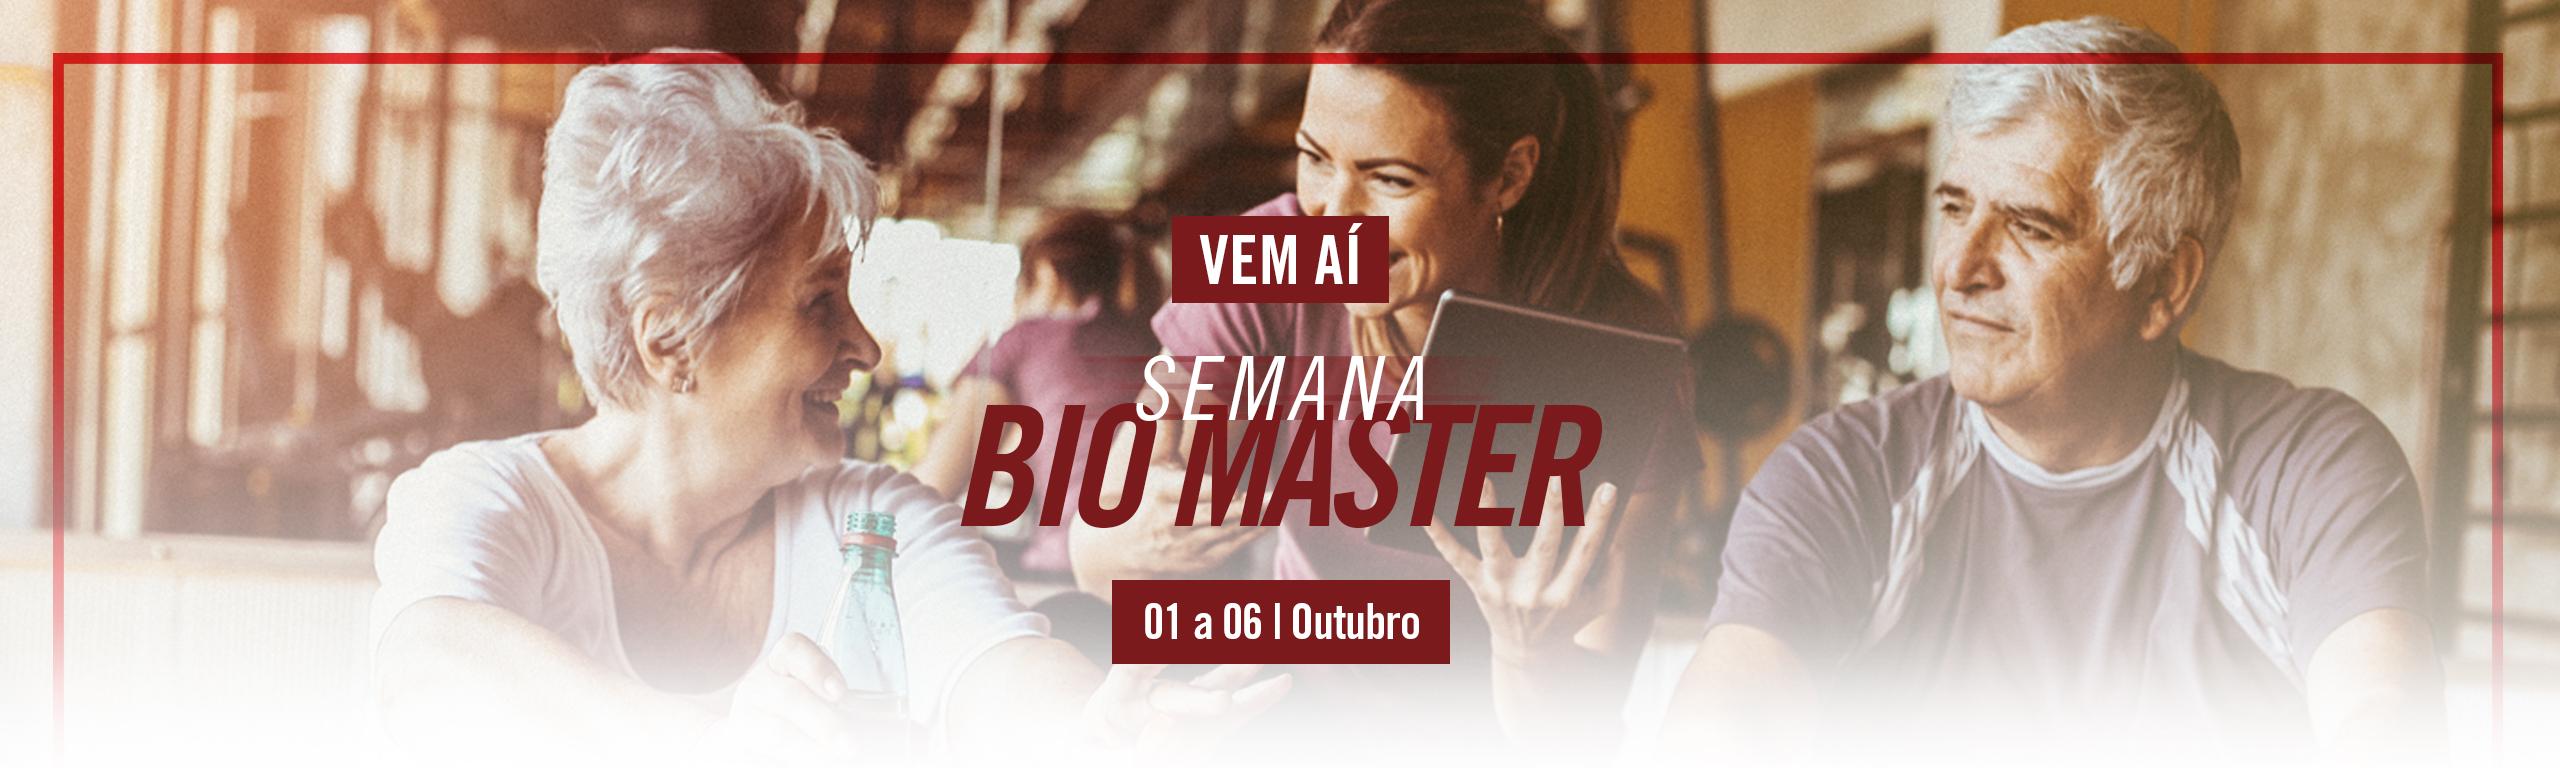 Banner_site_biomaster